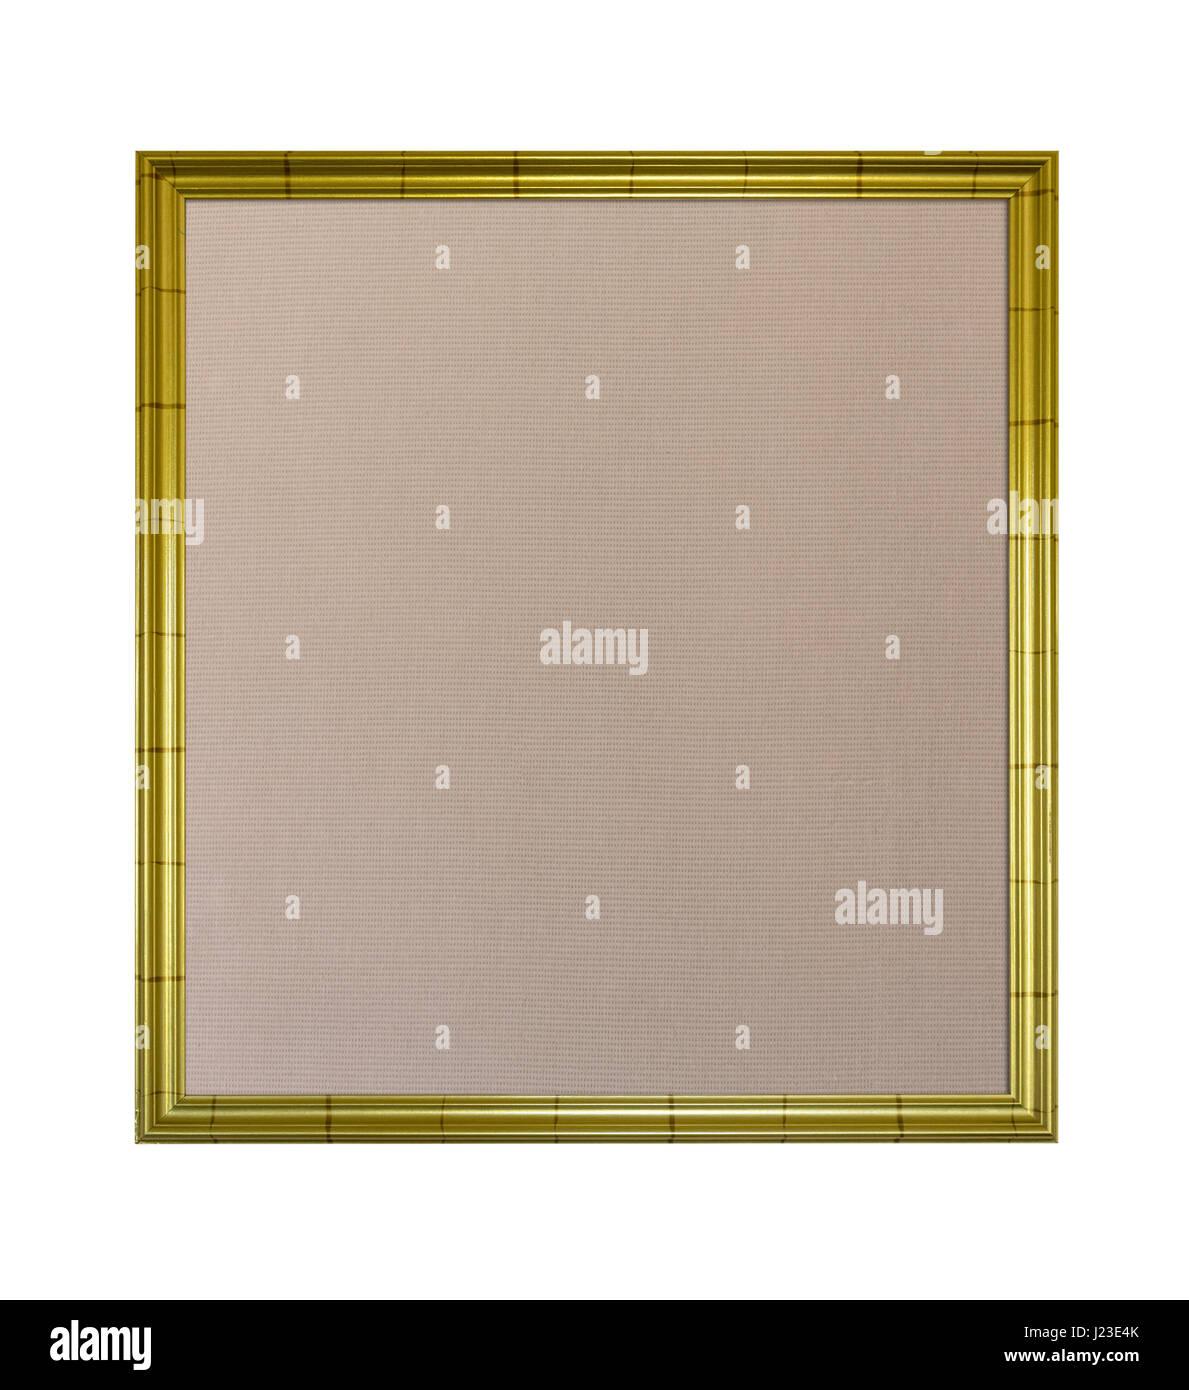 Bilderrahmen in Gold mit Pinnwand Pinwand Interieur Stockbild